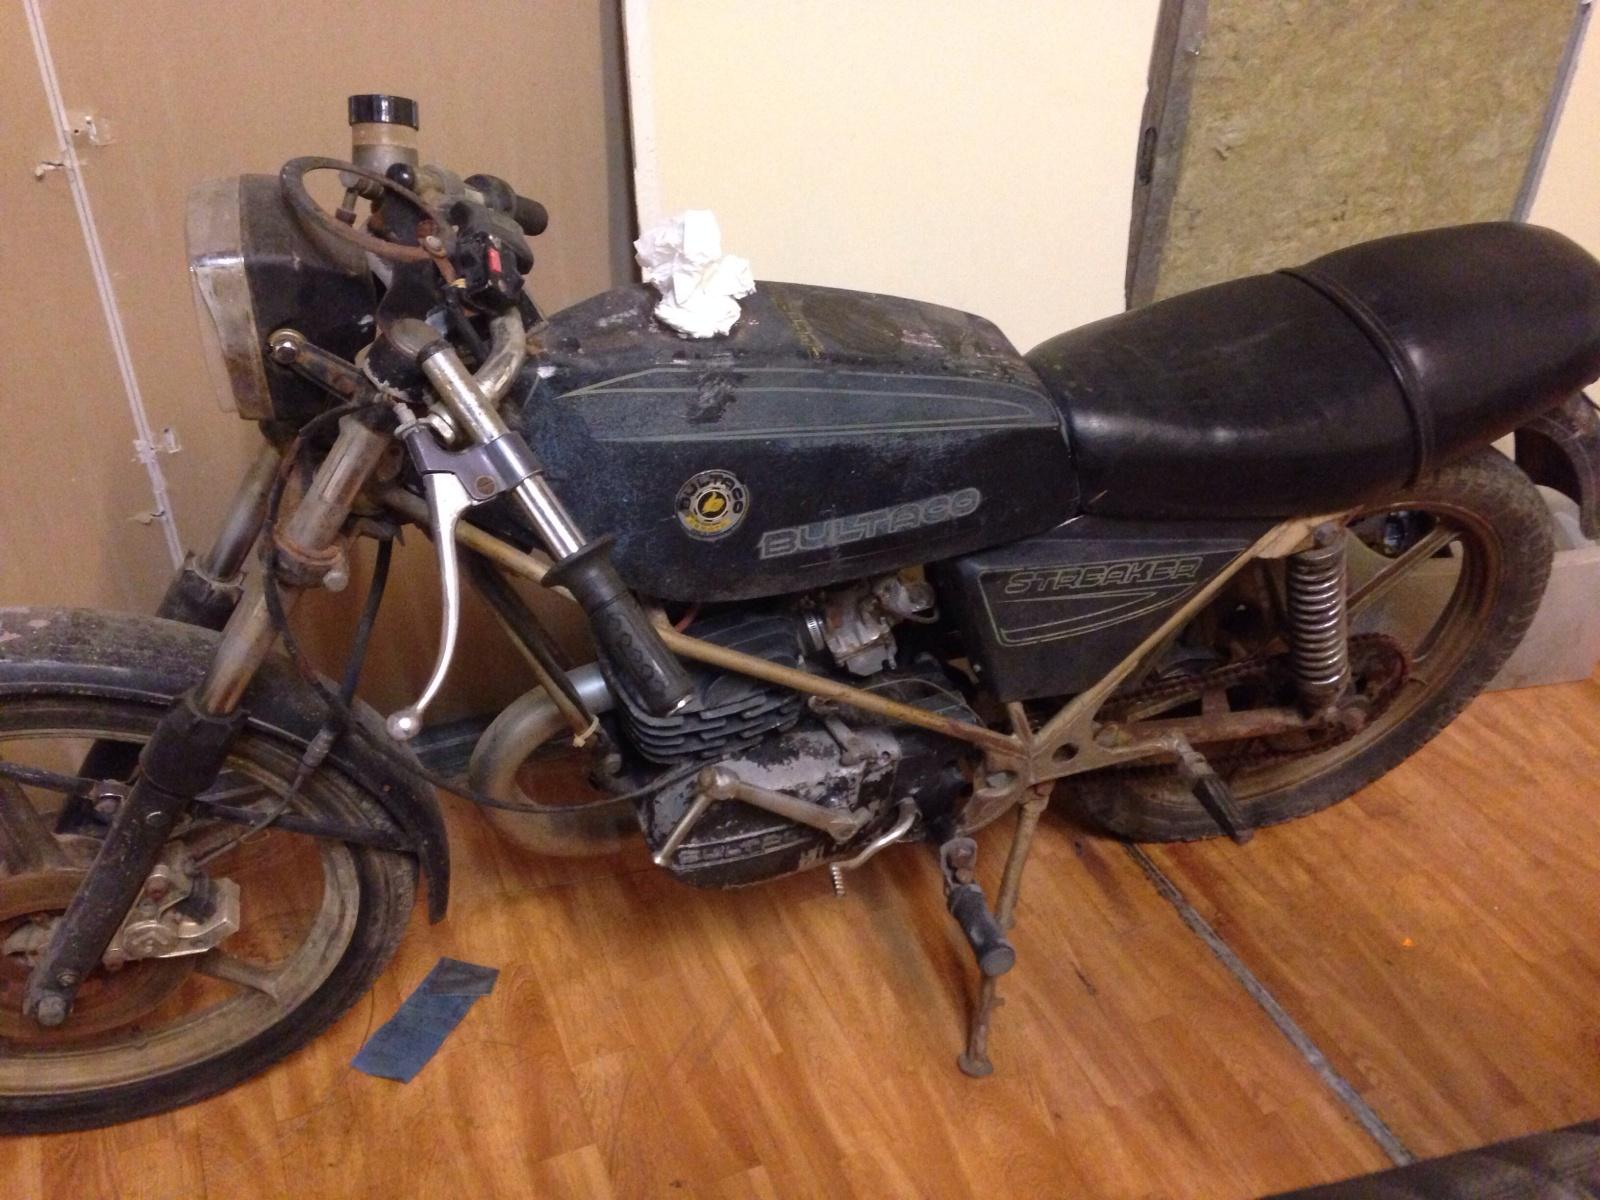 Bultaco streaker 2dukwfd